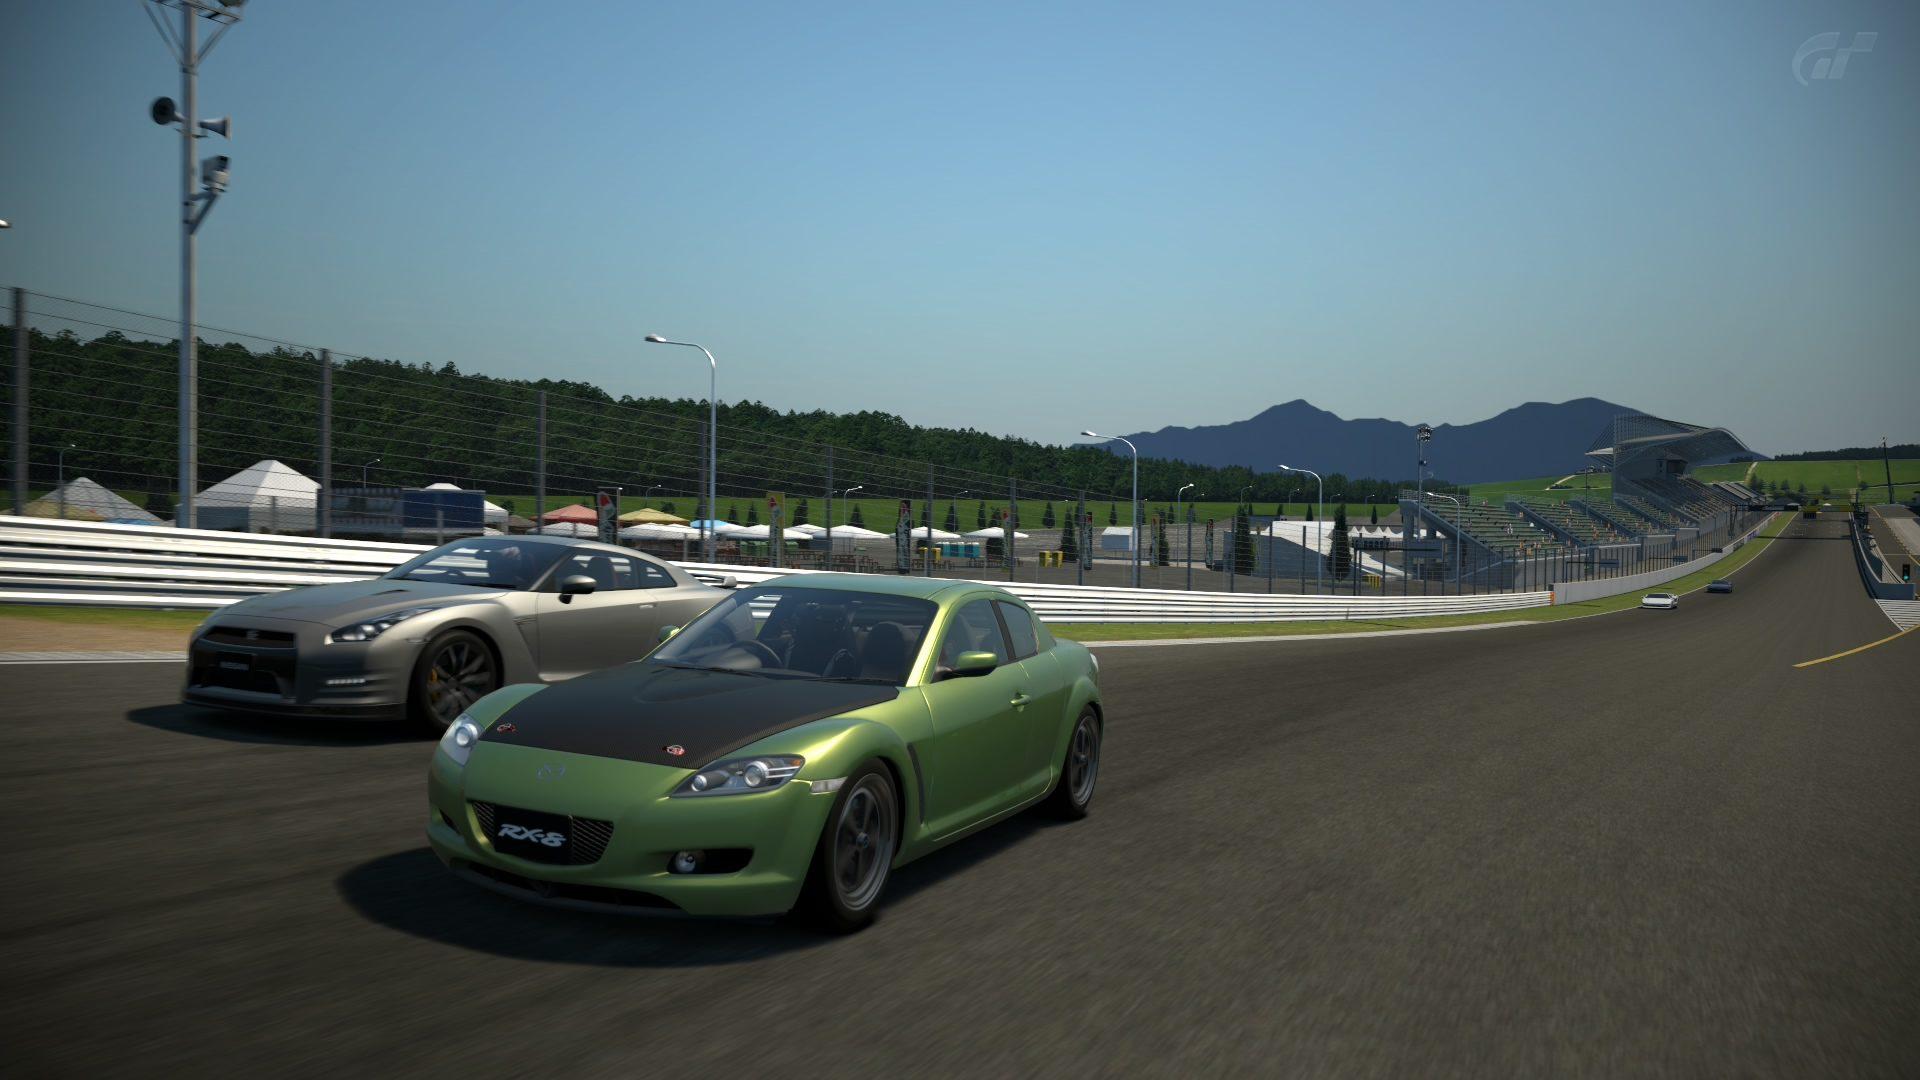 Apricot Hill Raceway_42.jpg